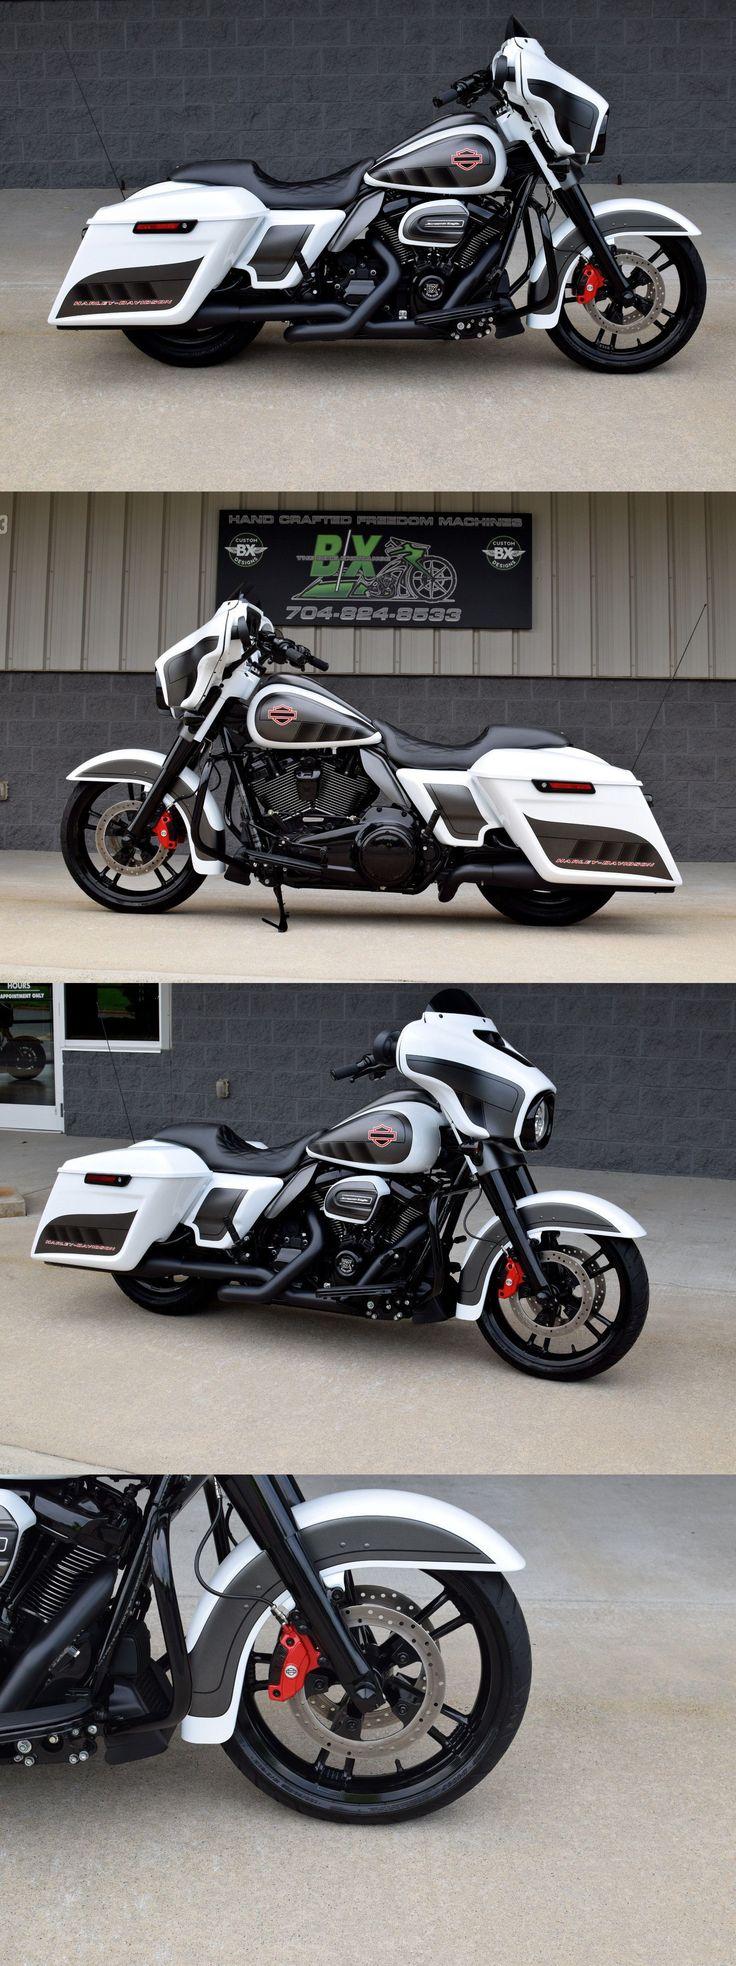 693 best harley davidson images on pinterest harley davidson bikes motorcycles 2017 harley davidson touring 2017 street glide special mint 16k fandeluxe Choice Image